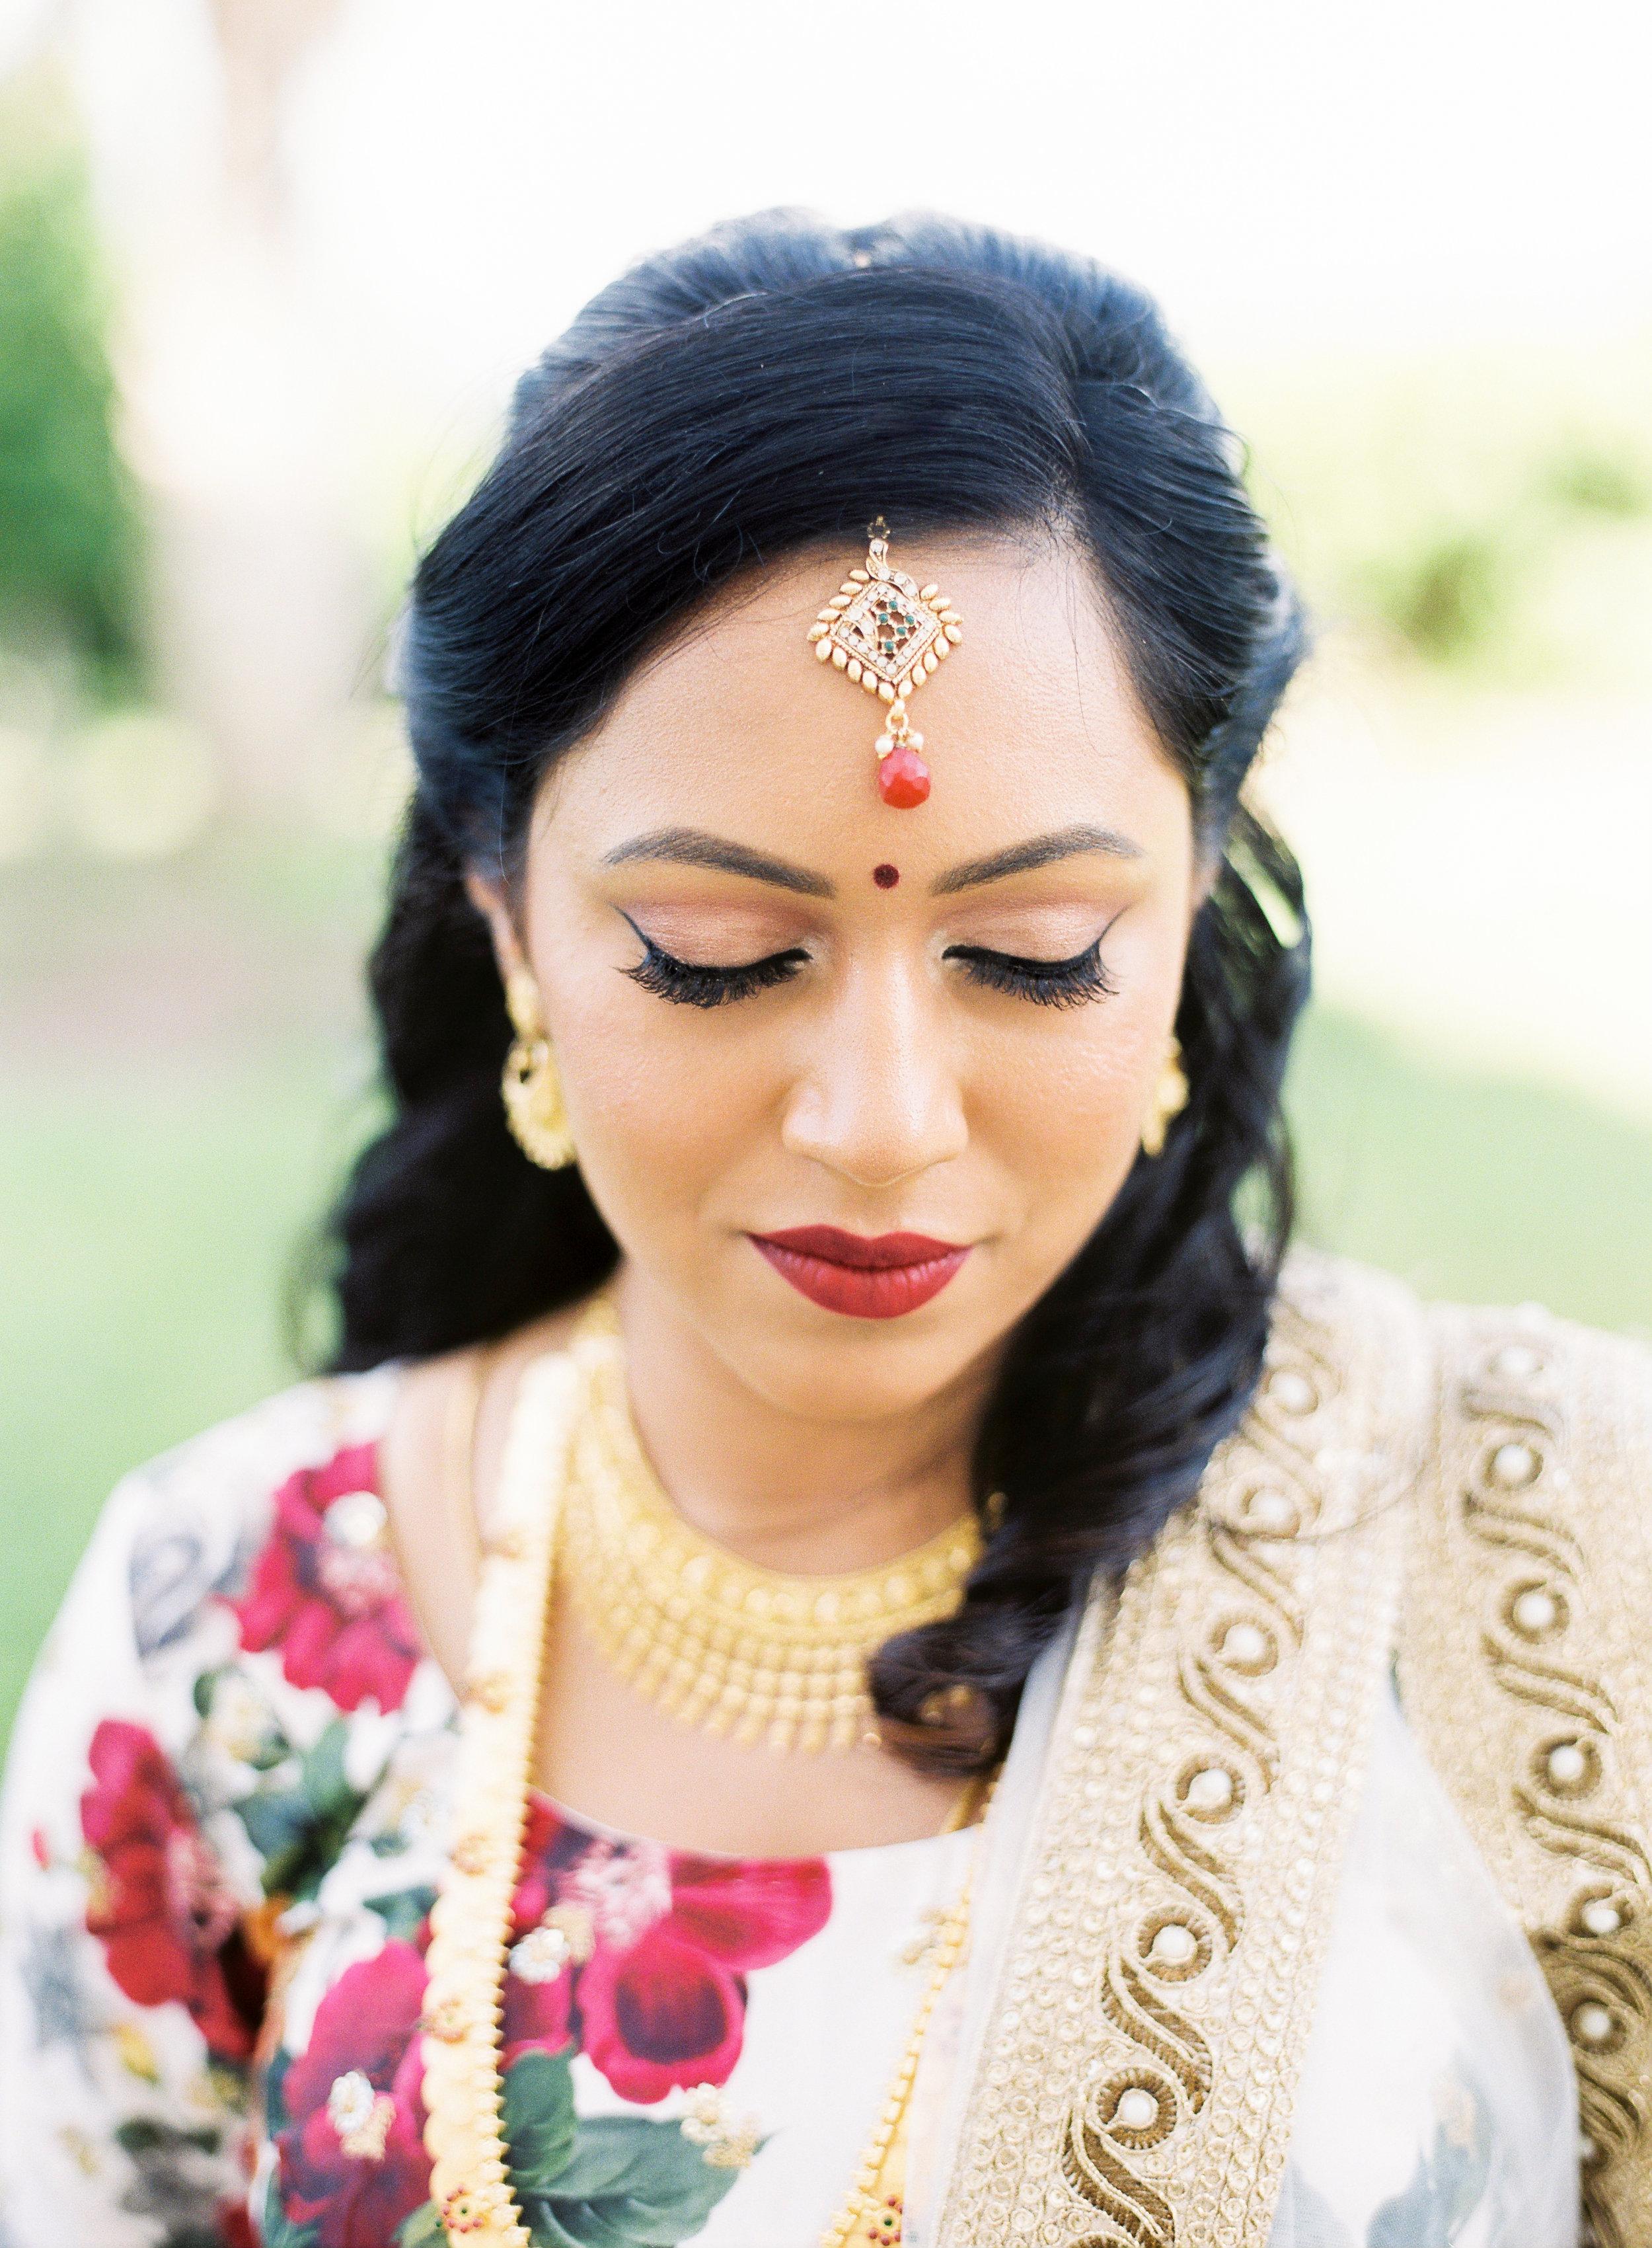 melbourne-orlando-fl-indian-wedding-photos-28.jpg